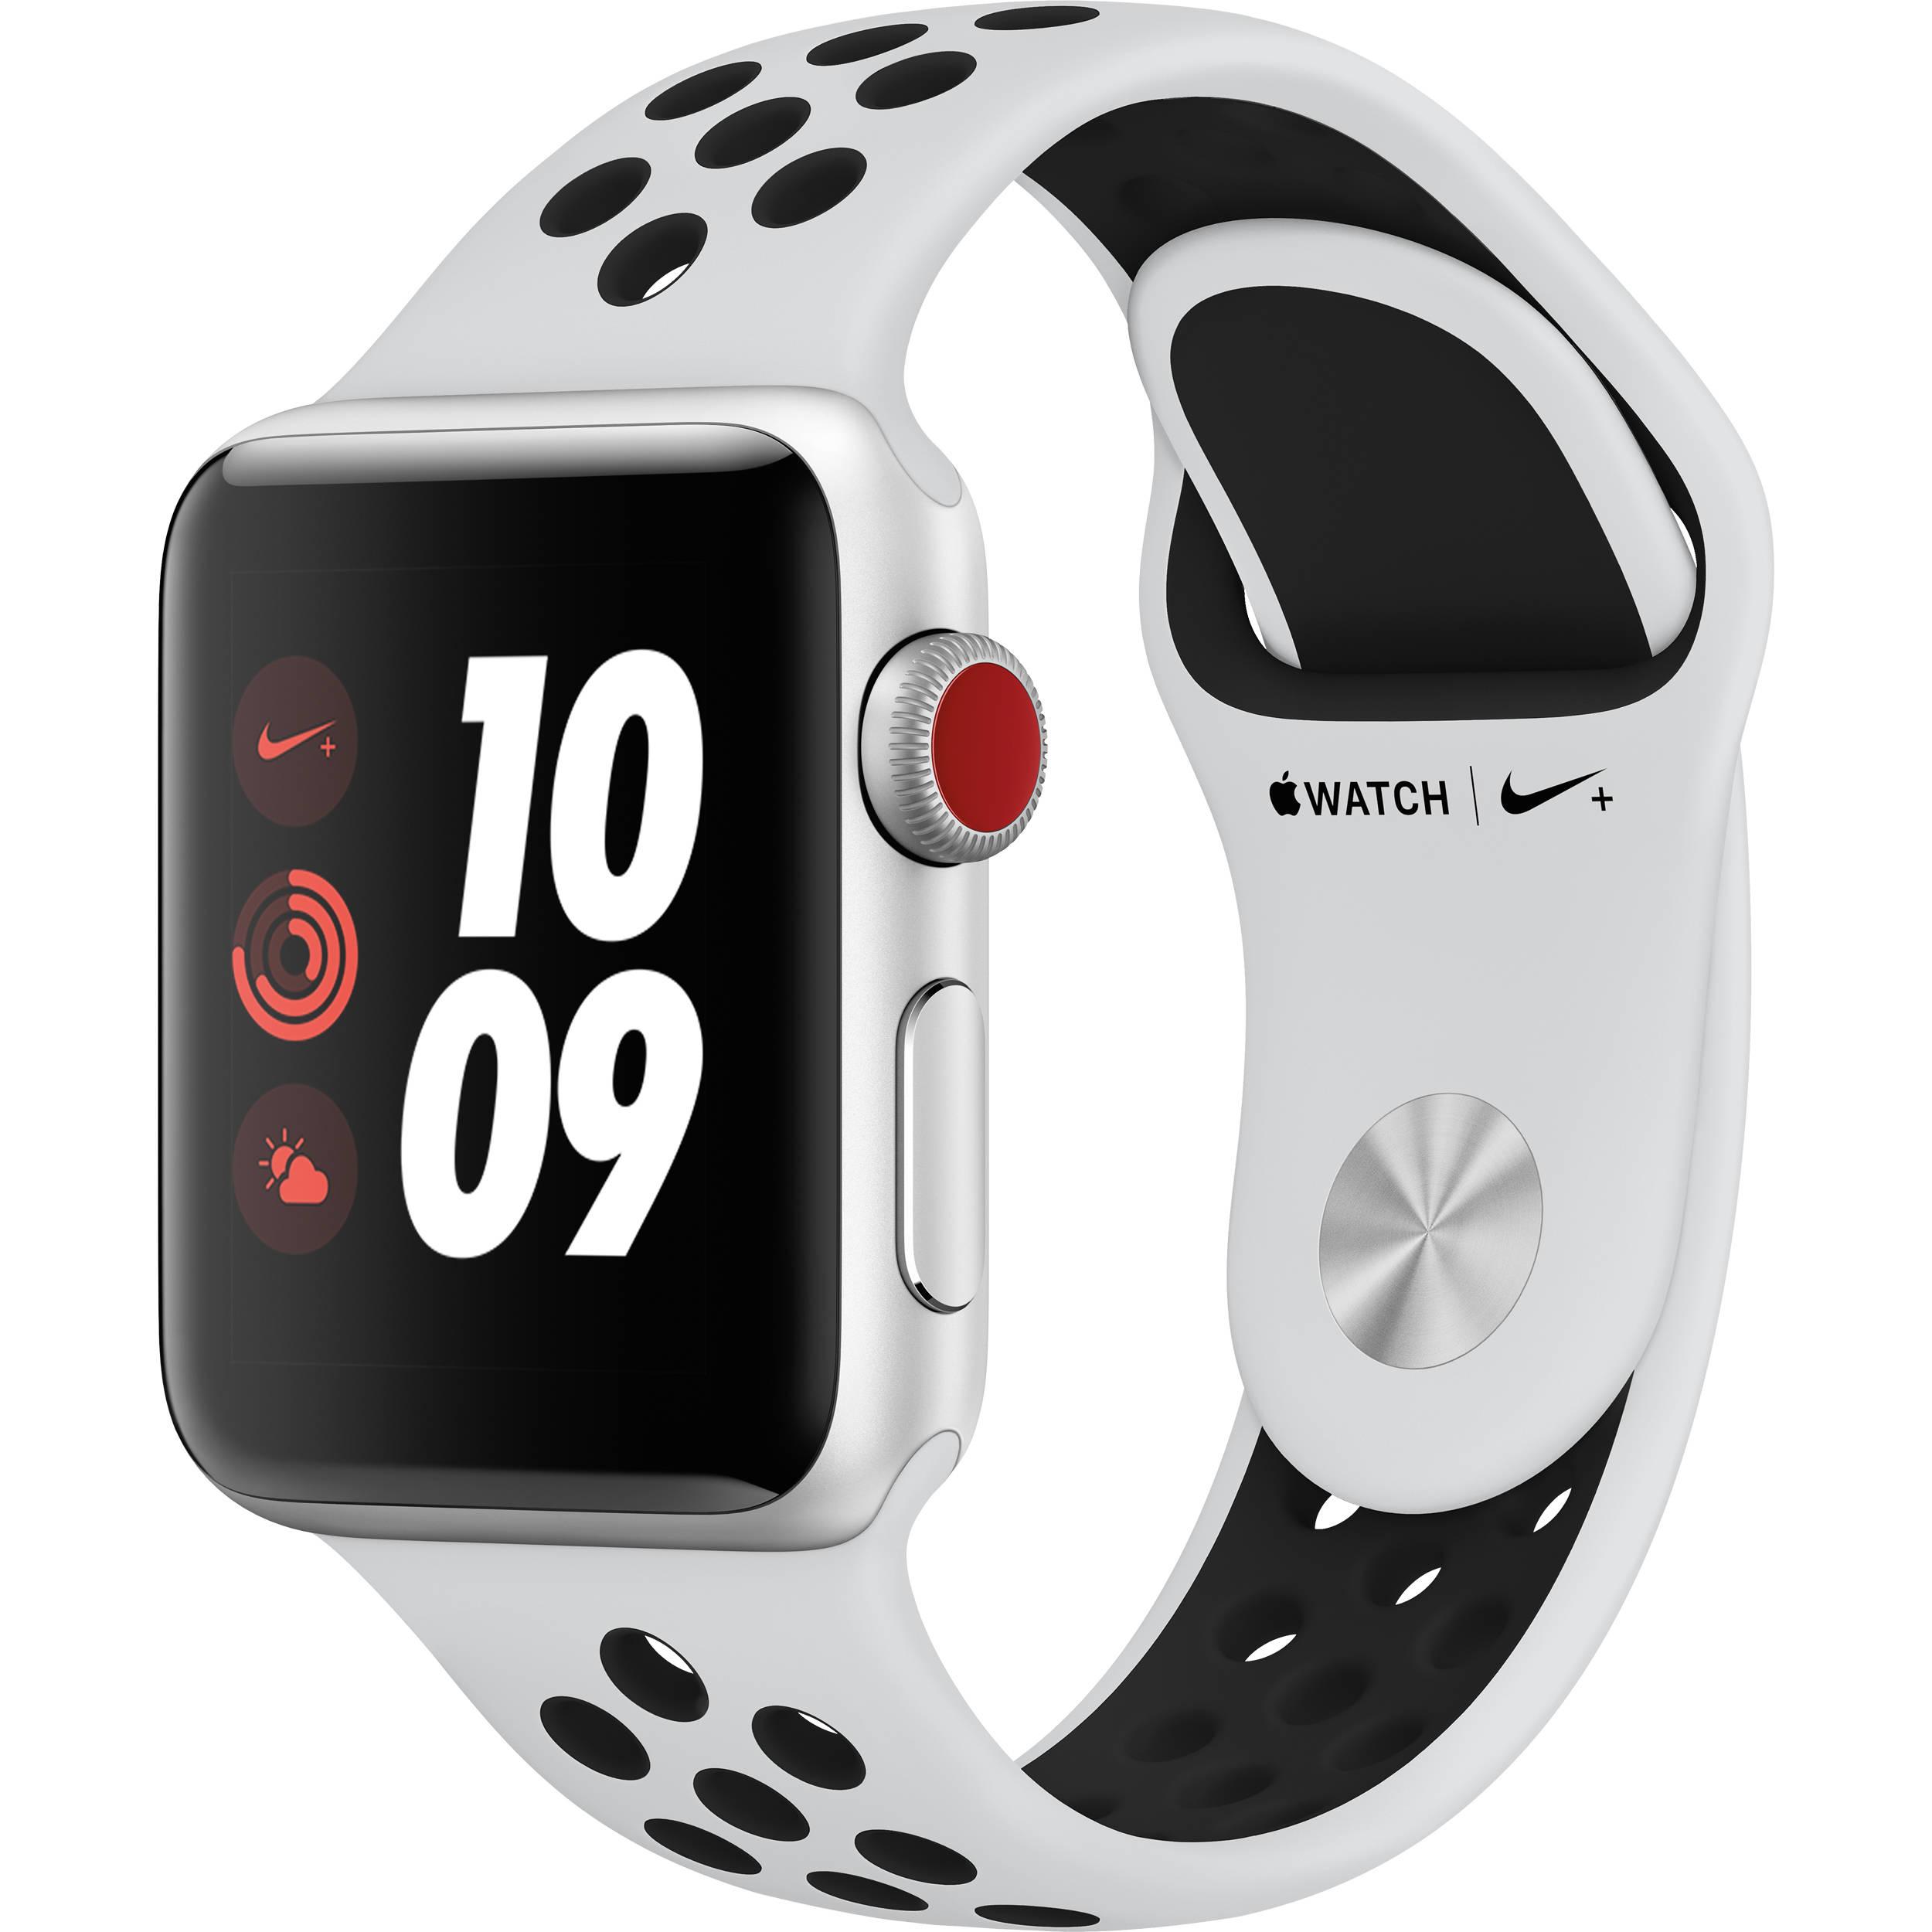 Apple Watch Nike+ Series 3 38mm Smartwatch (GPS + Cellular, Silver Aluminum  Case, Pure Platinum/Black Nike Sport Band)